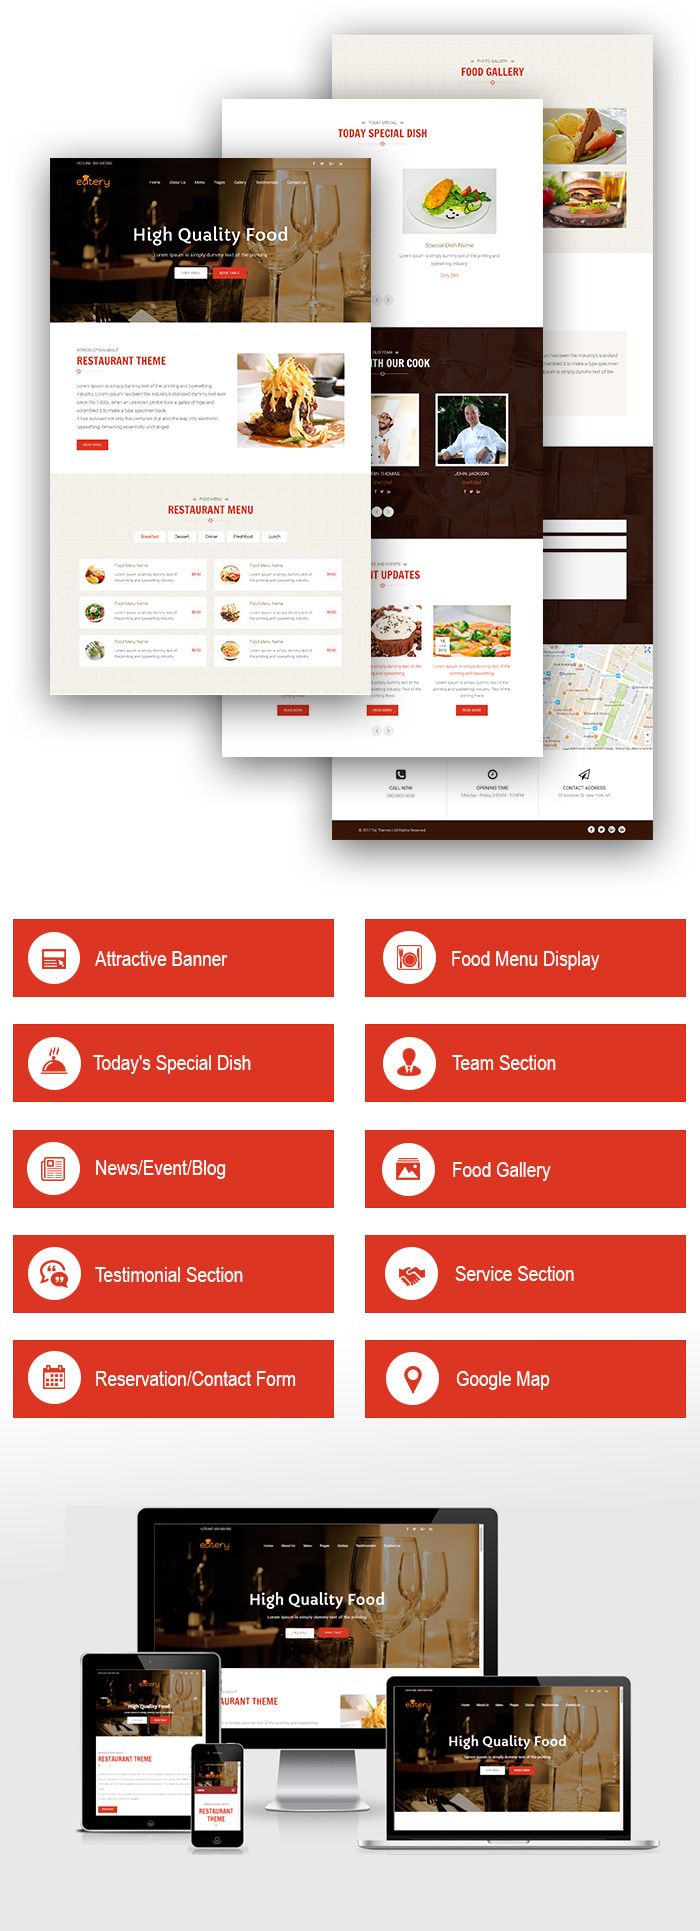 best 25 fast food restaurant ideas on pinterest fast food logos